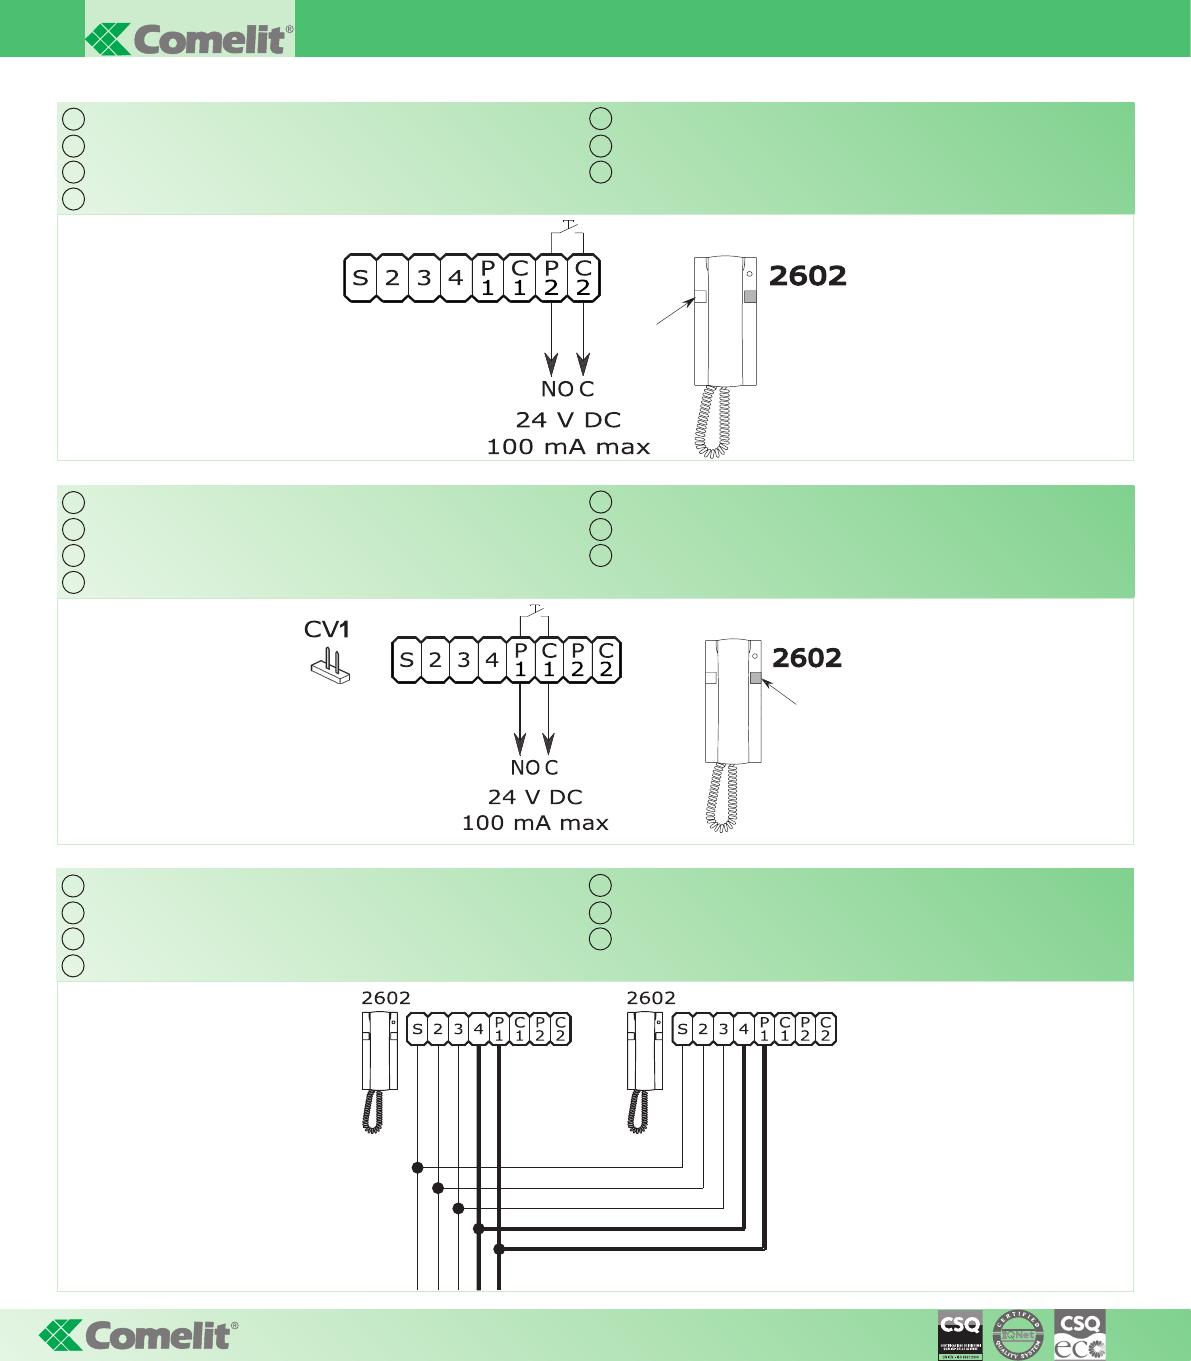 Handleiding Comelit 8274 Ft Kit 16 Audio Kit Pagina 1 Van 4